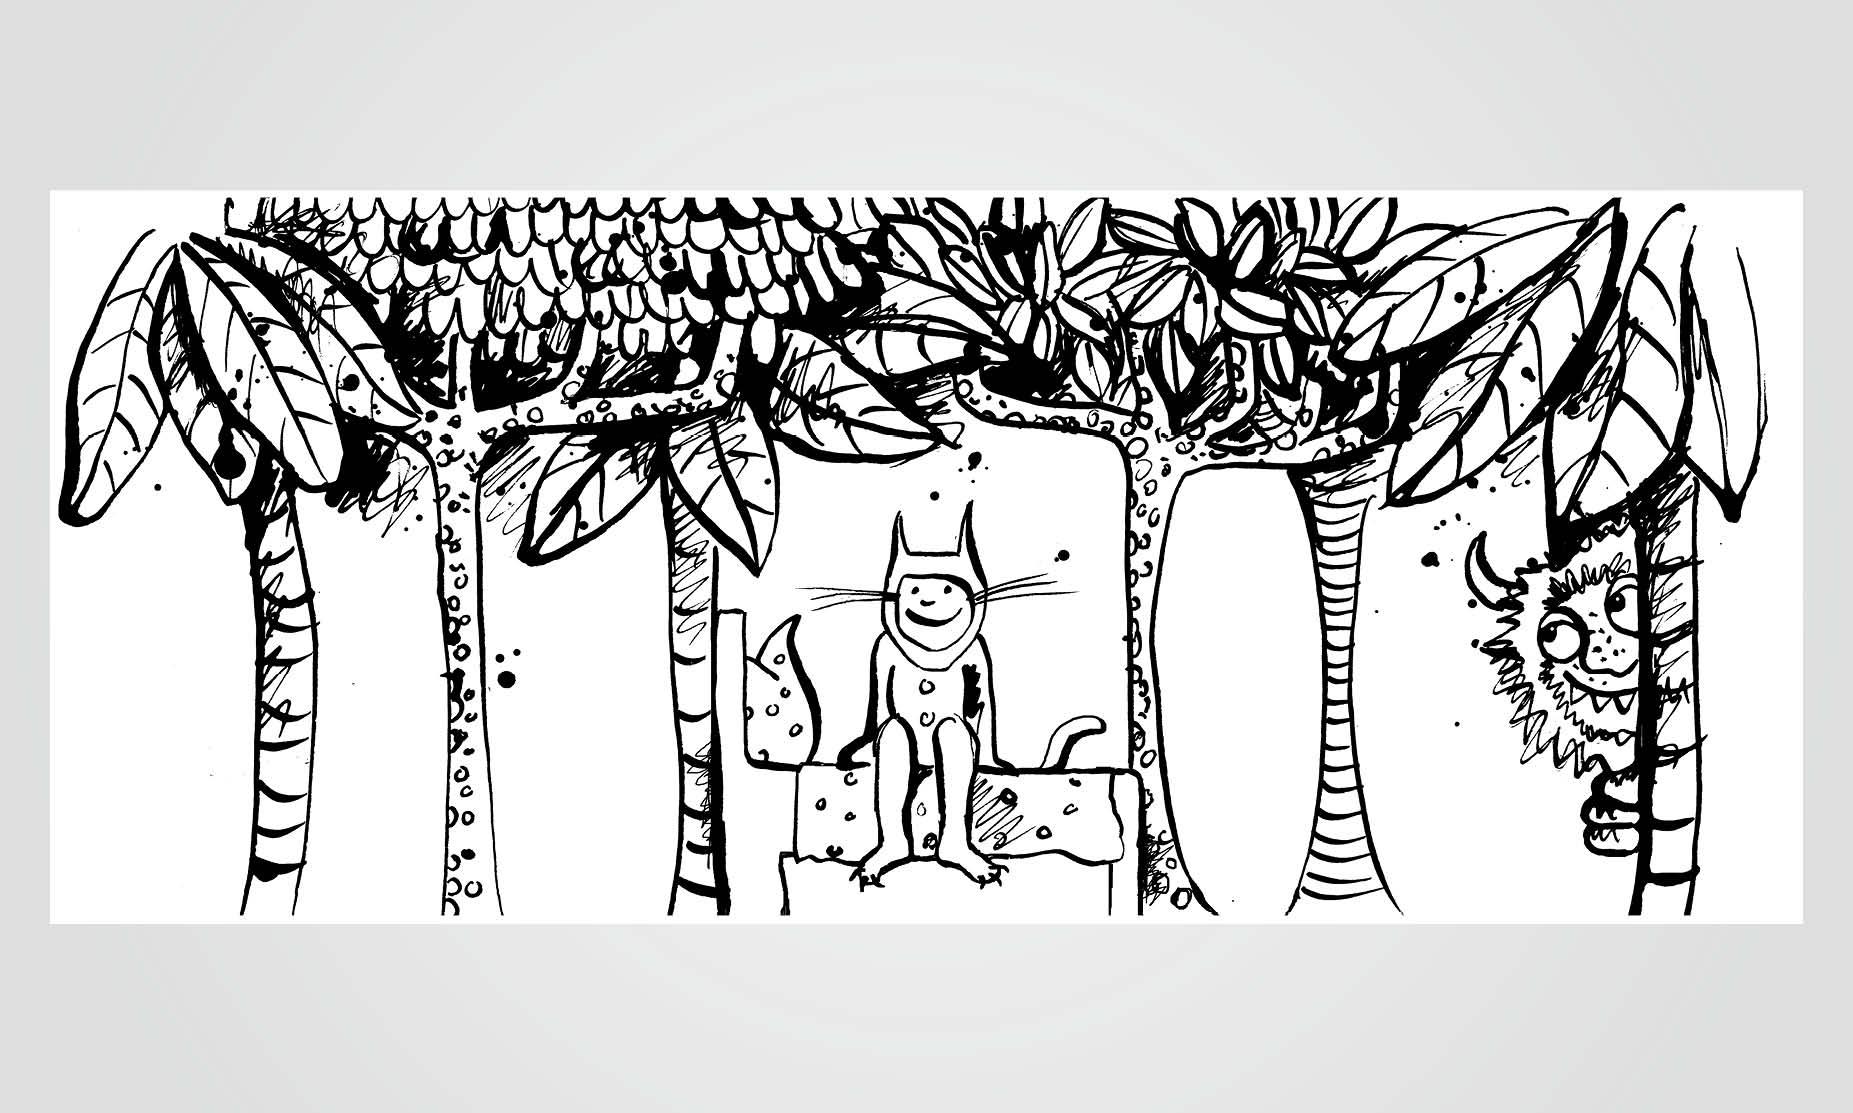 kinobecher-illustration-stadtwerke-essen-01.jpg